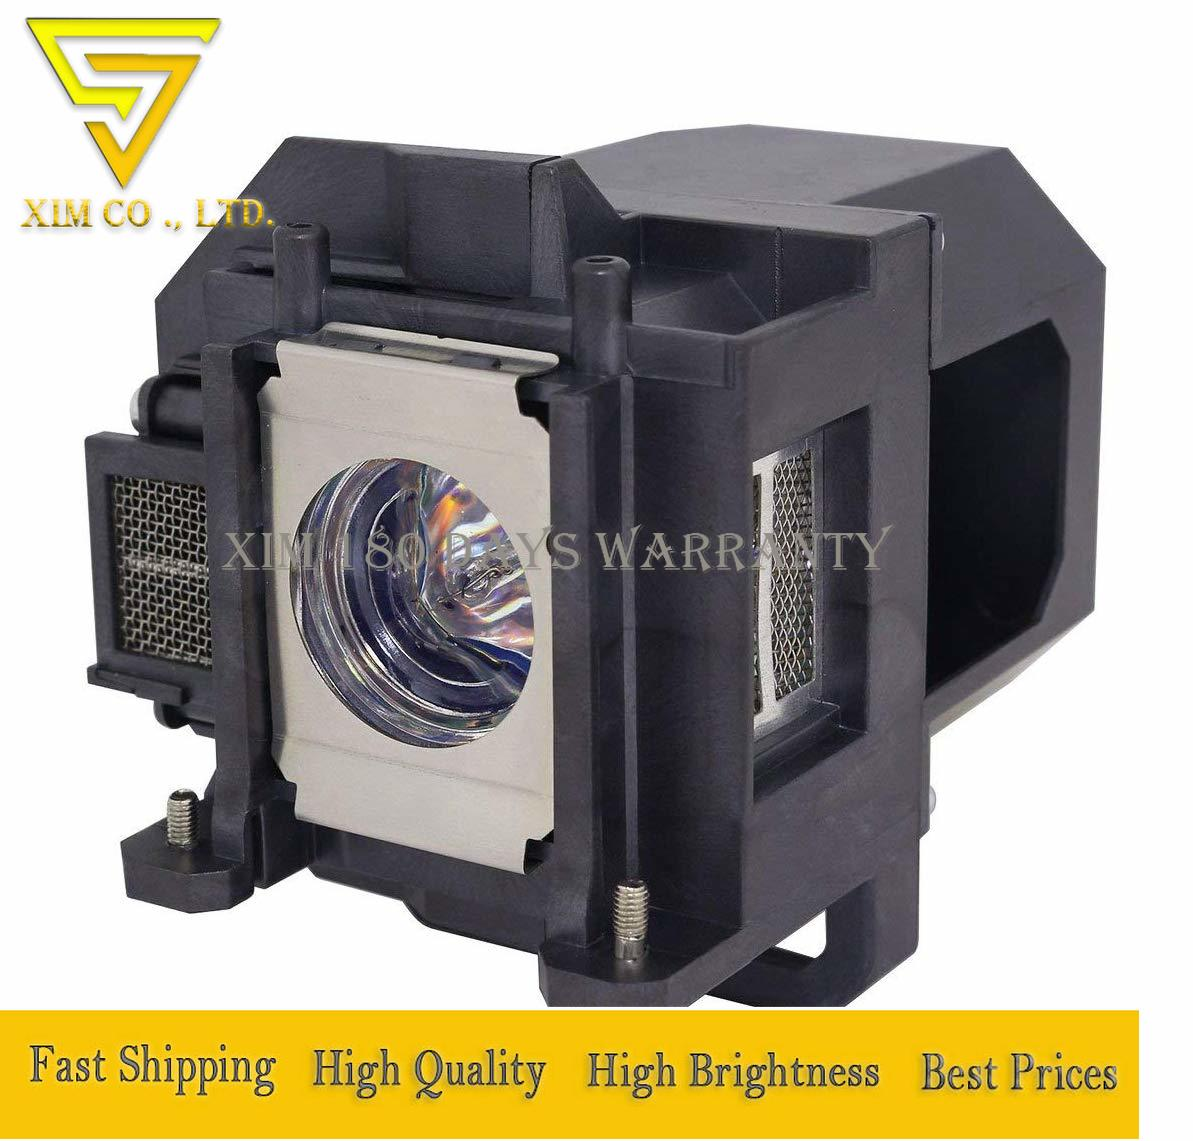 Projector Lamp ELPLP53 V13H010L53 For EPSON EB-1830 EB-1900 EB-1910 EB-1915 EB-1920W EB-1925W EB-1913 H313B 1925W EMP-1915 VS400